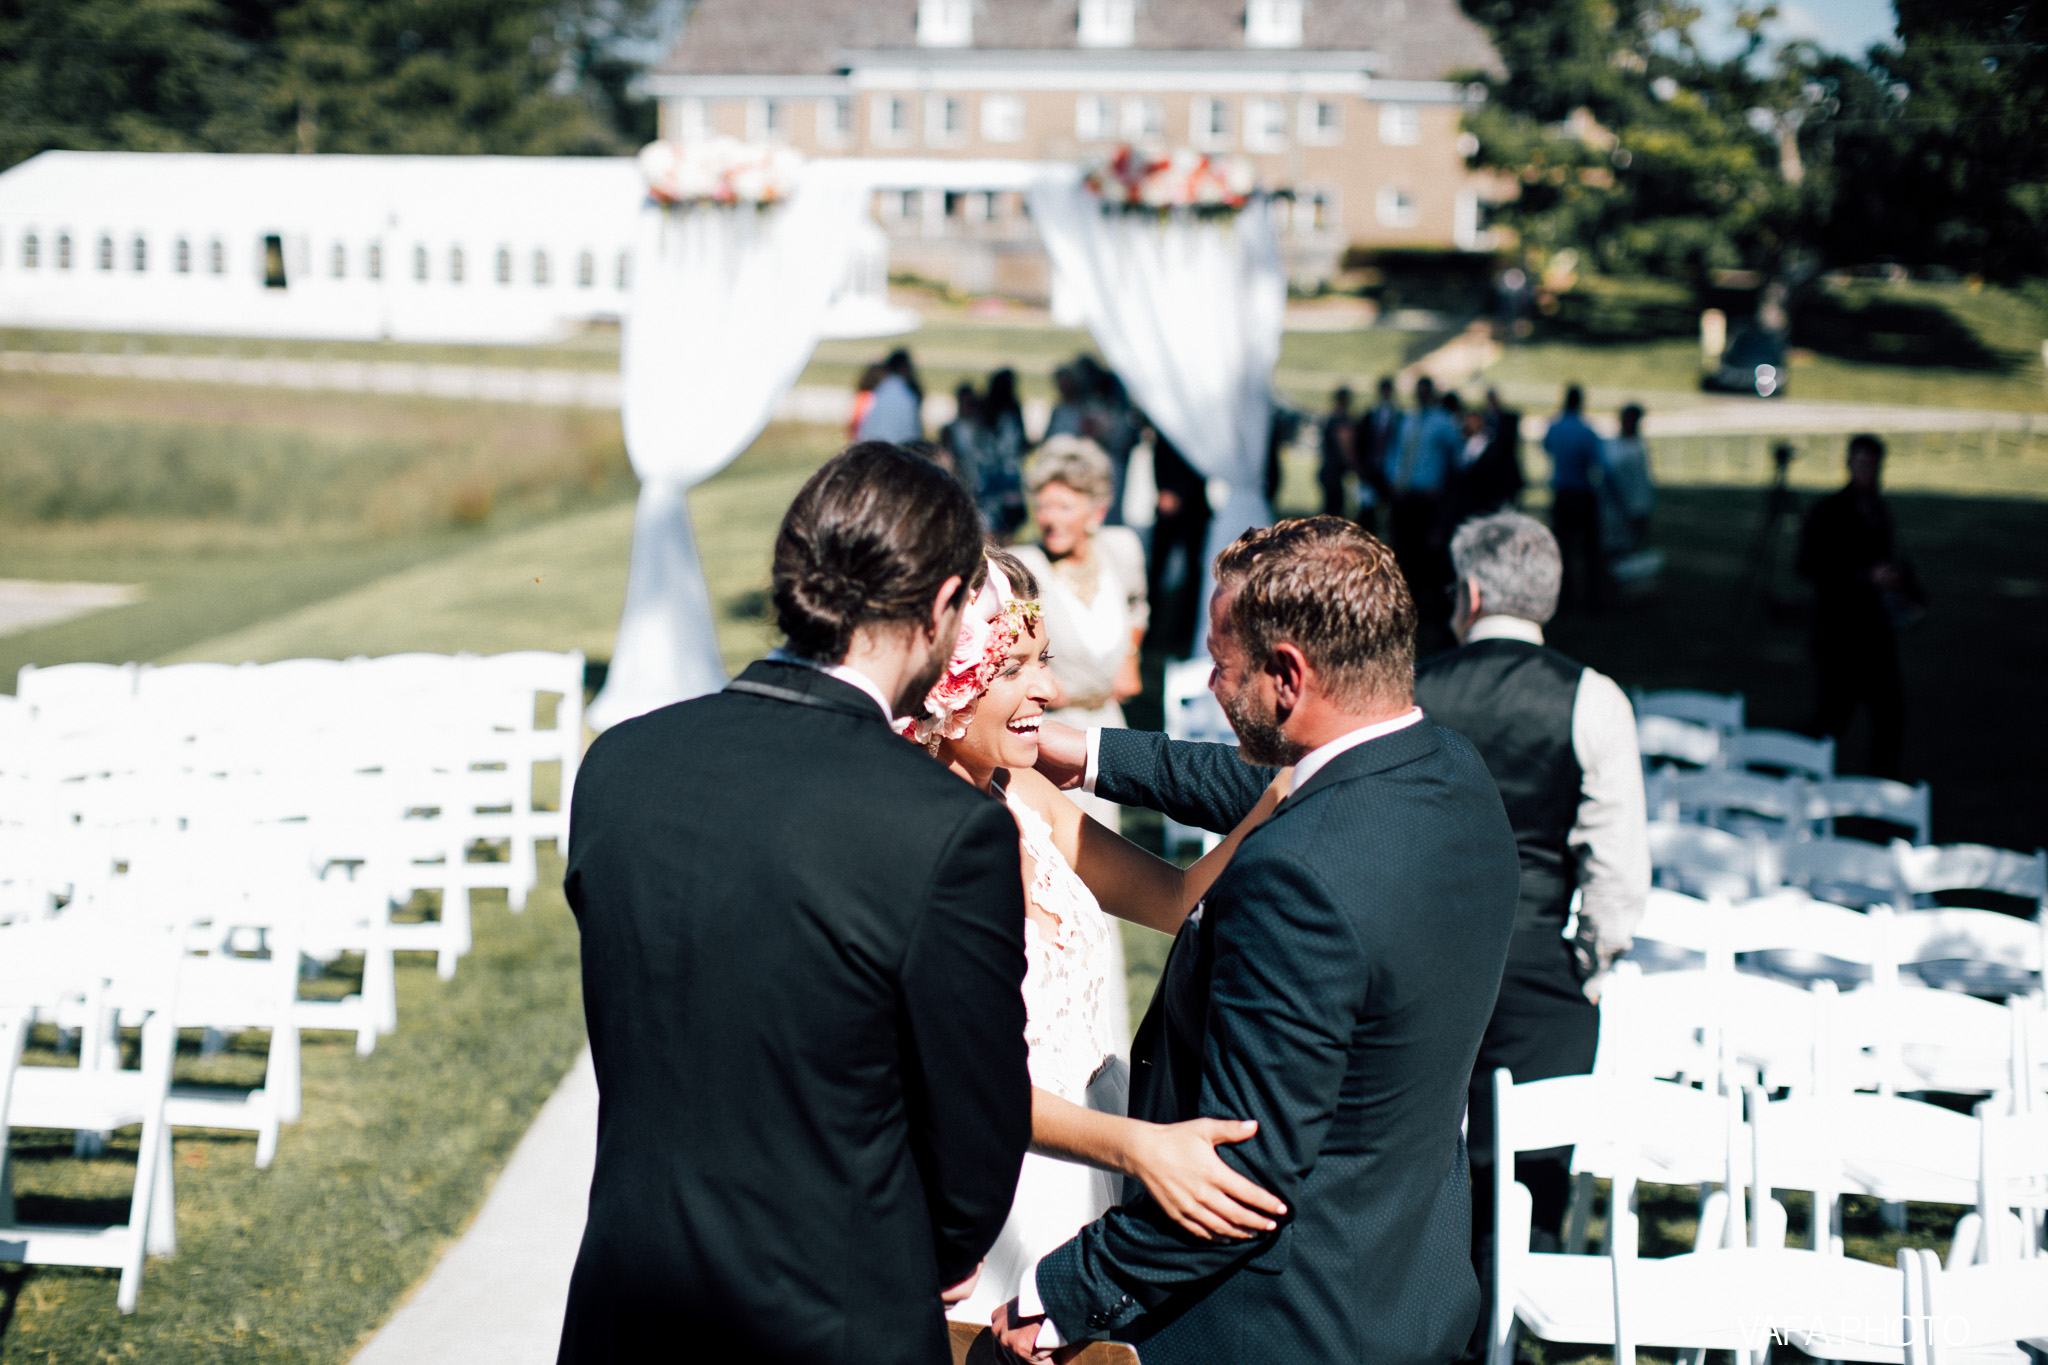 The-Felt-Estate-Wedding-Kailie-David-Vafa-Photo-412.jpg